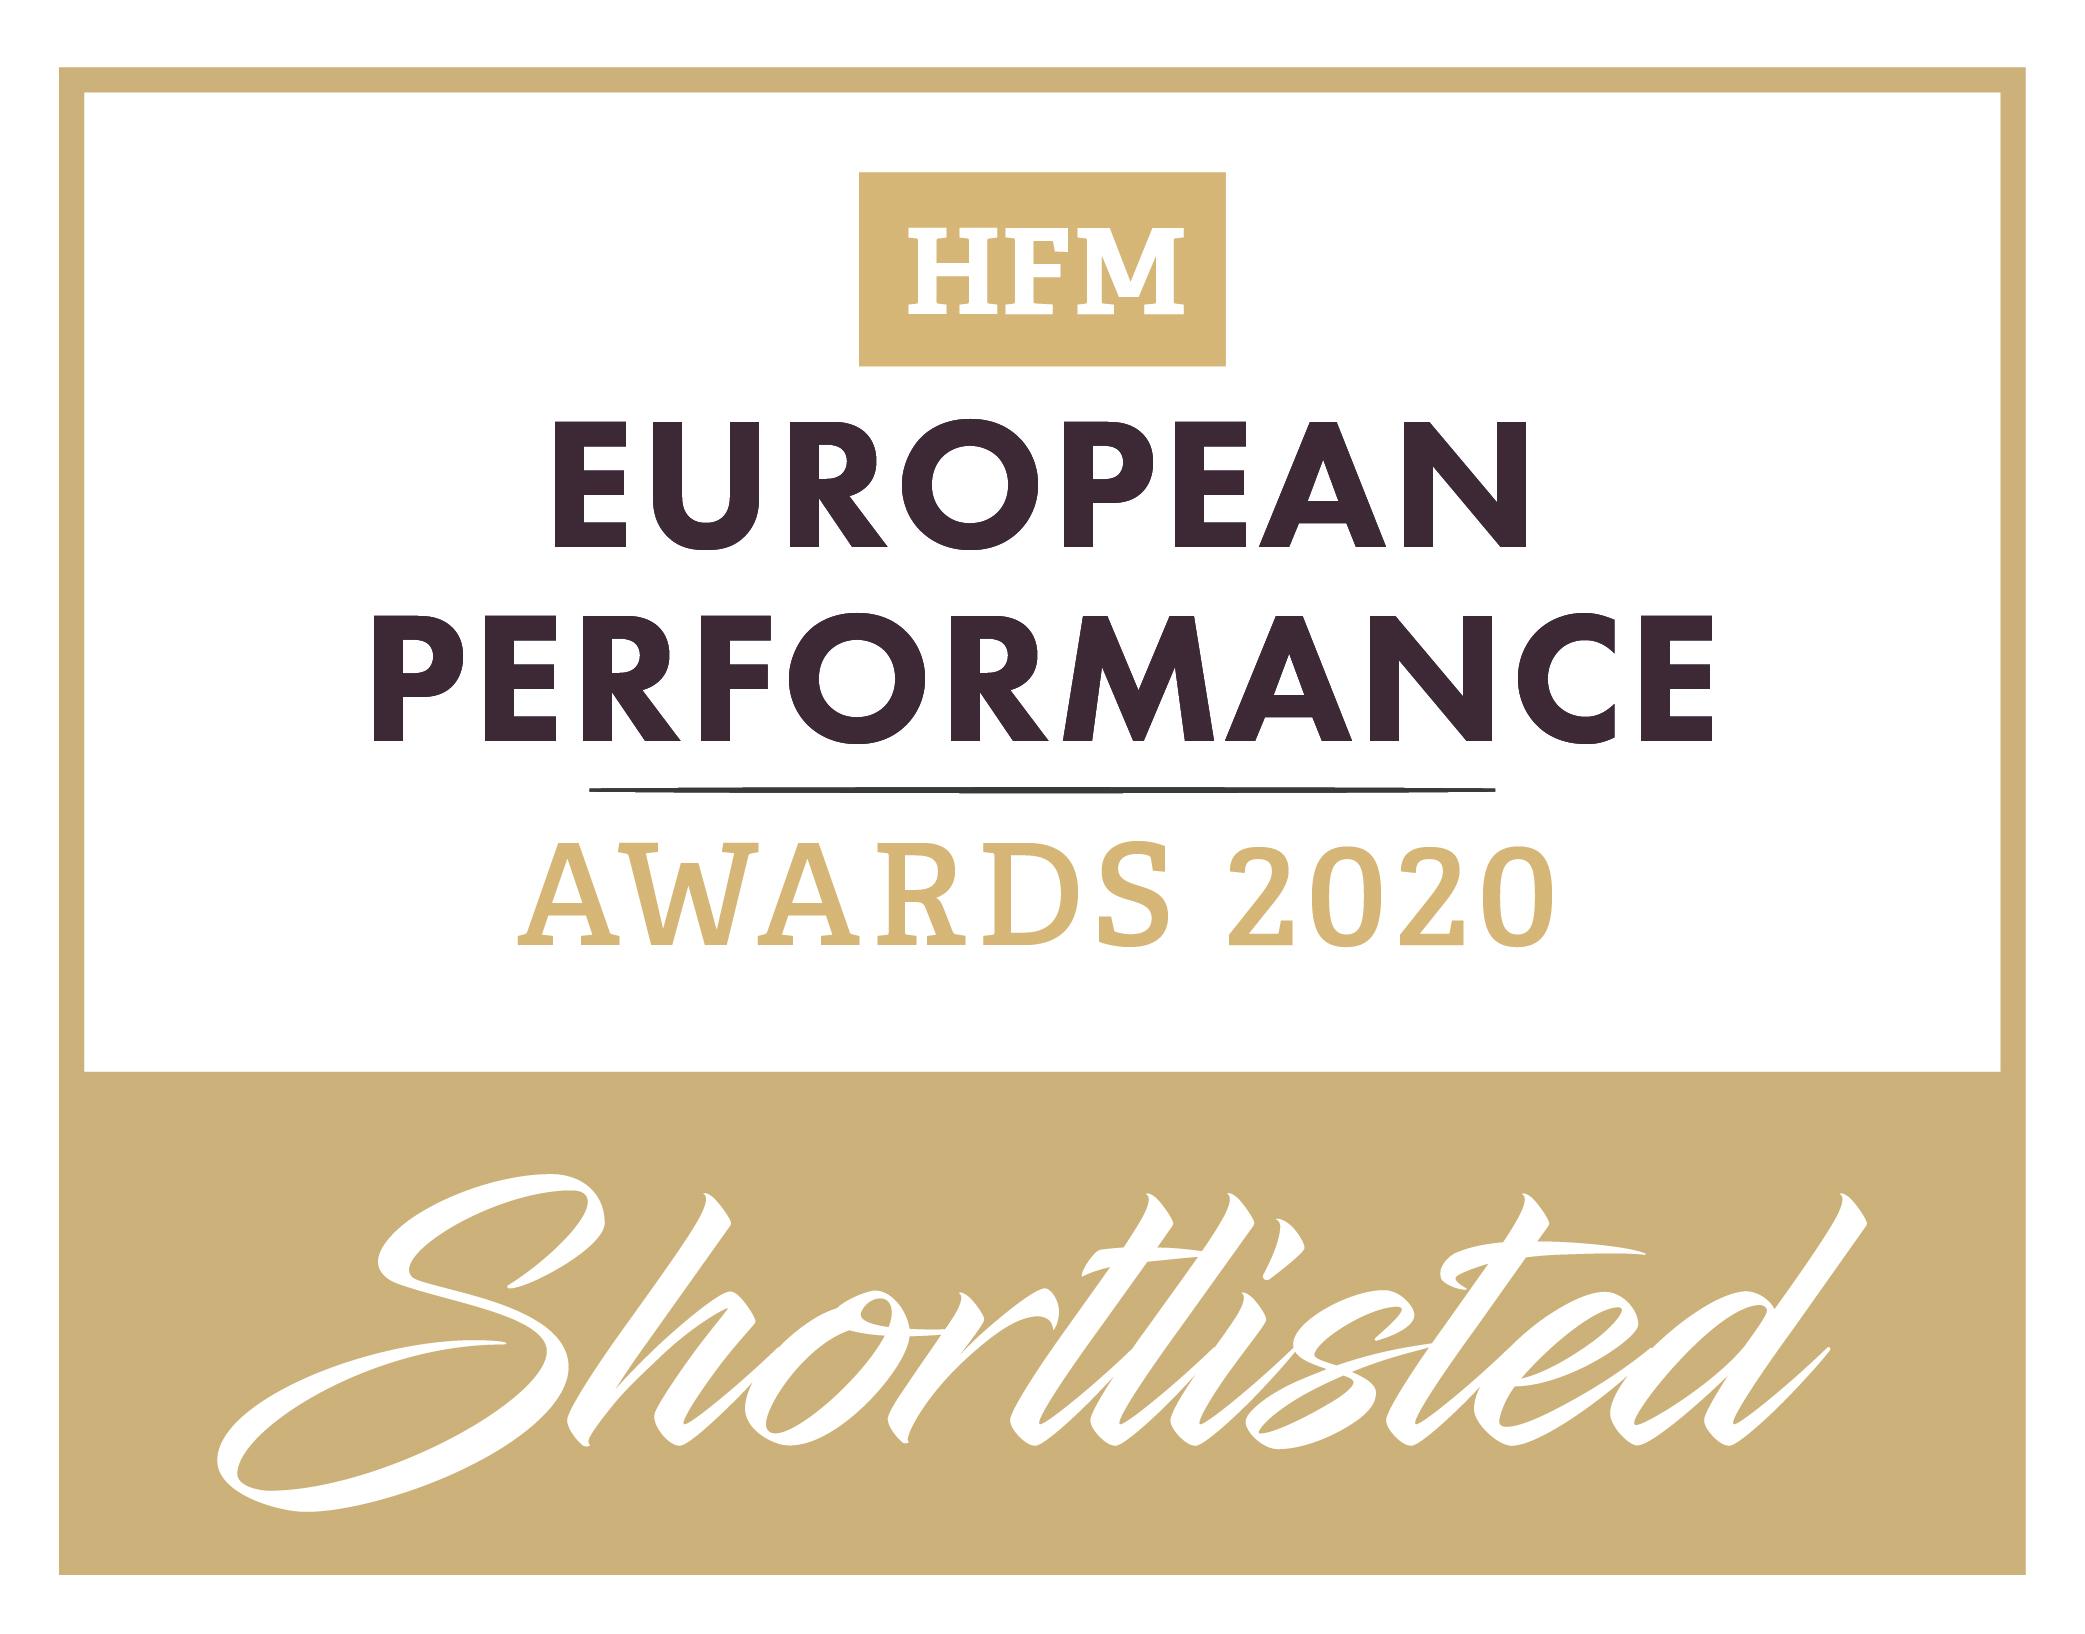 HFM EU Performance Awards 2020__Shortlisted